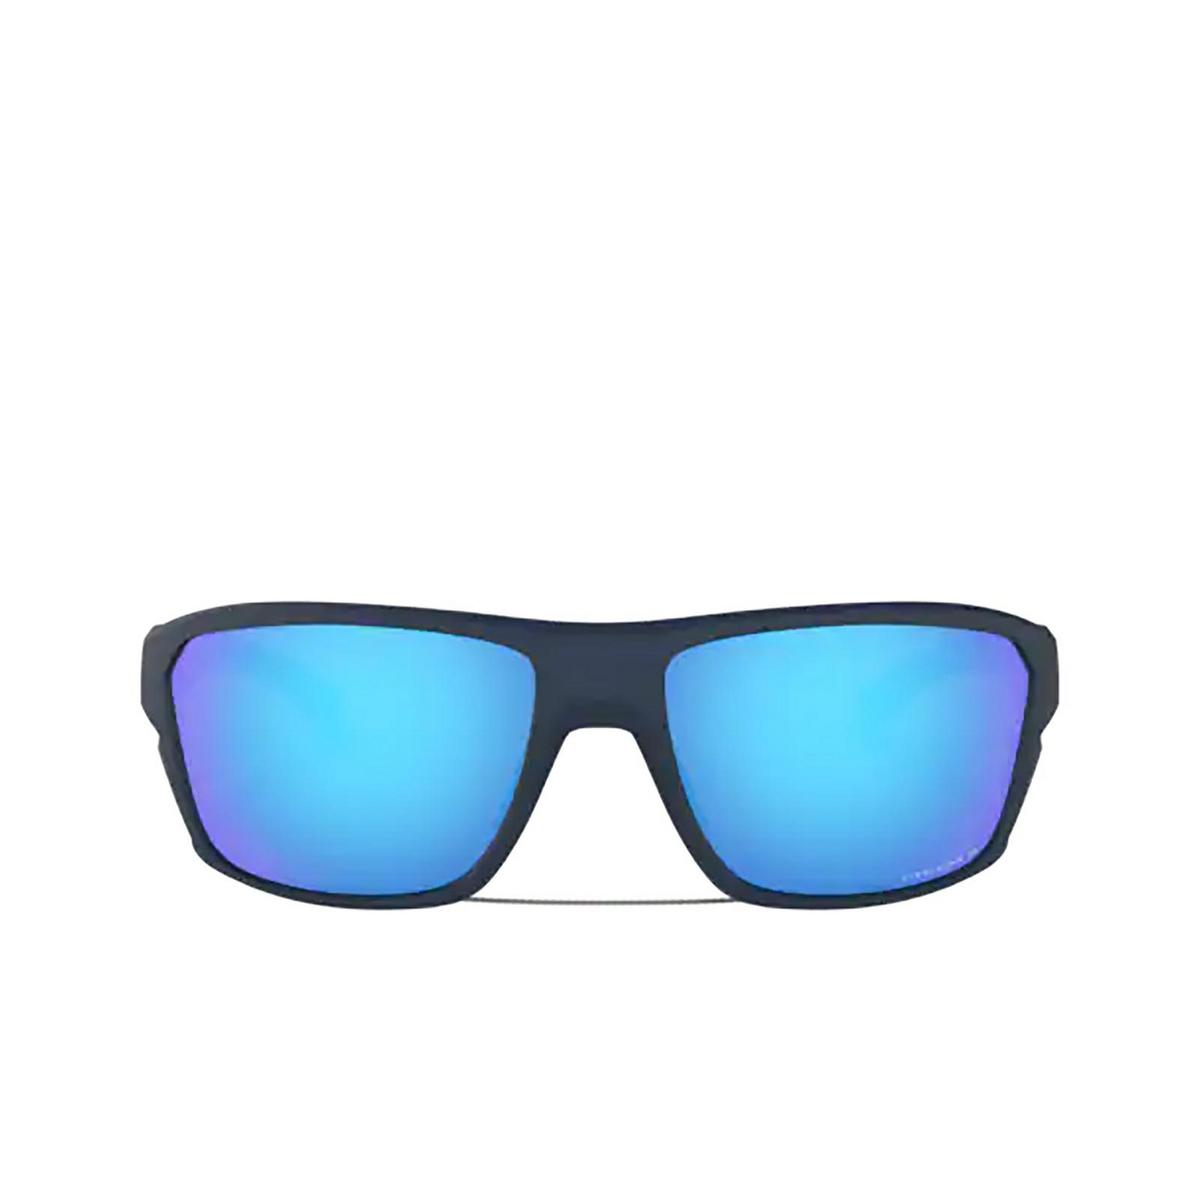 Oakley® Rectangle Sunglasses: Split Shot OO9416 color Matte Trans Blue 941604 - 1/3.